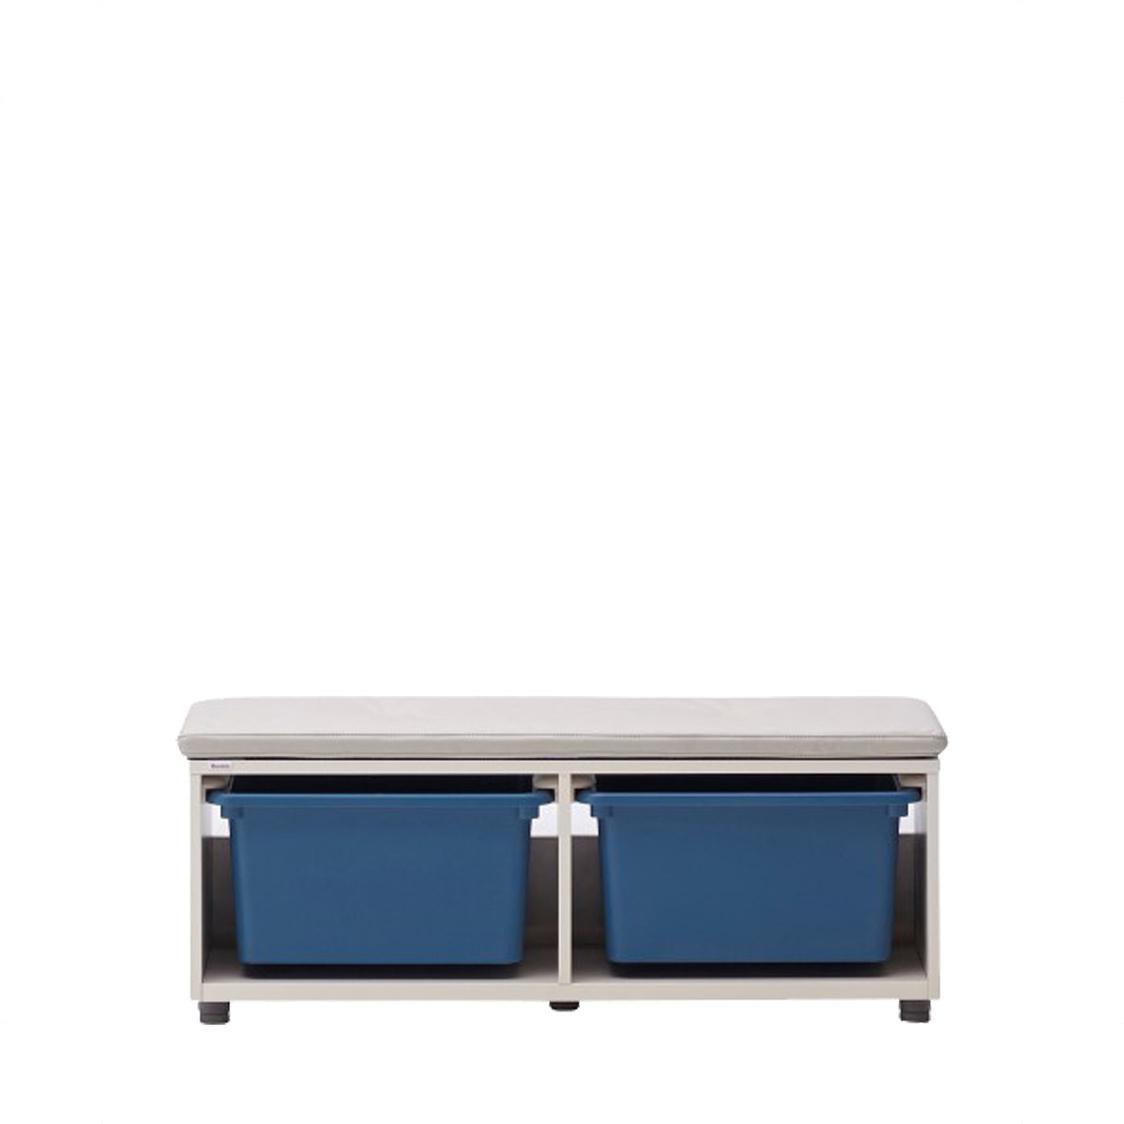 Iloom Eddi Kids950W Bench With Storage Hsfp191-Ivkb